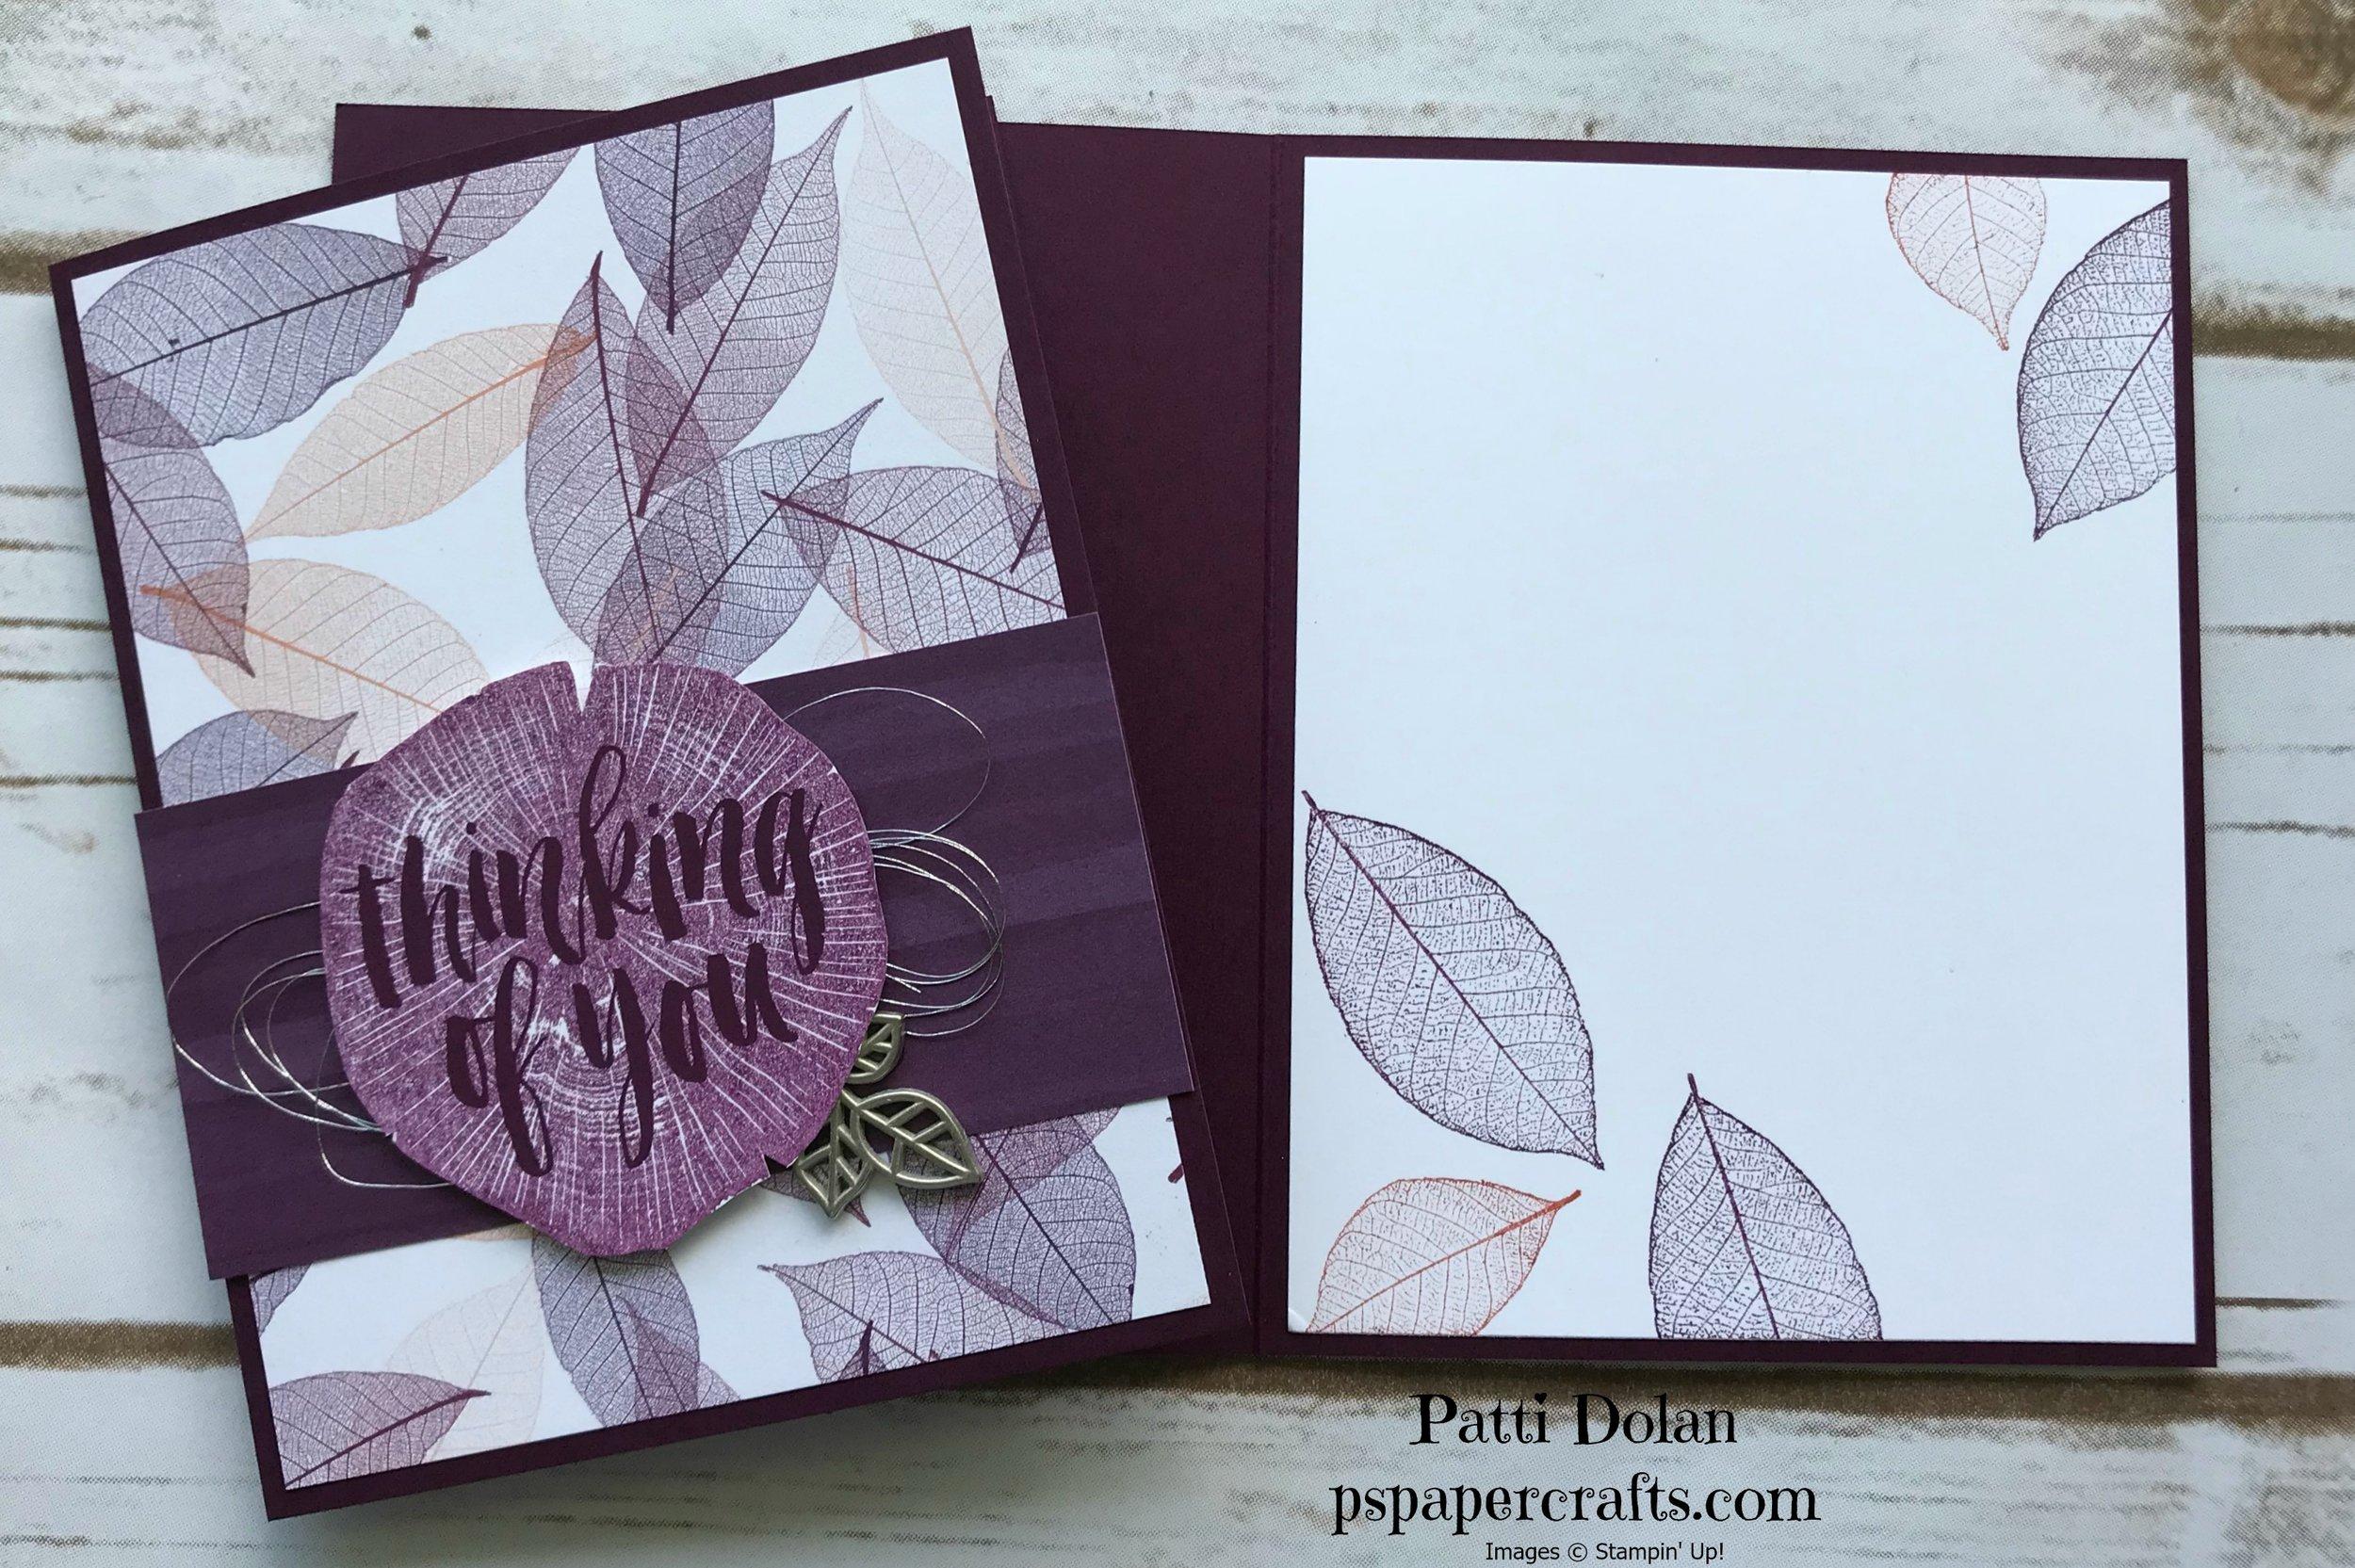 httpswww.pspapercrafts.comblog2018619fun-animal-outing-cards - Inside.jpg